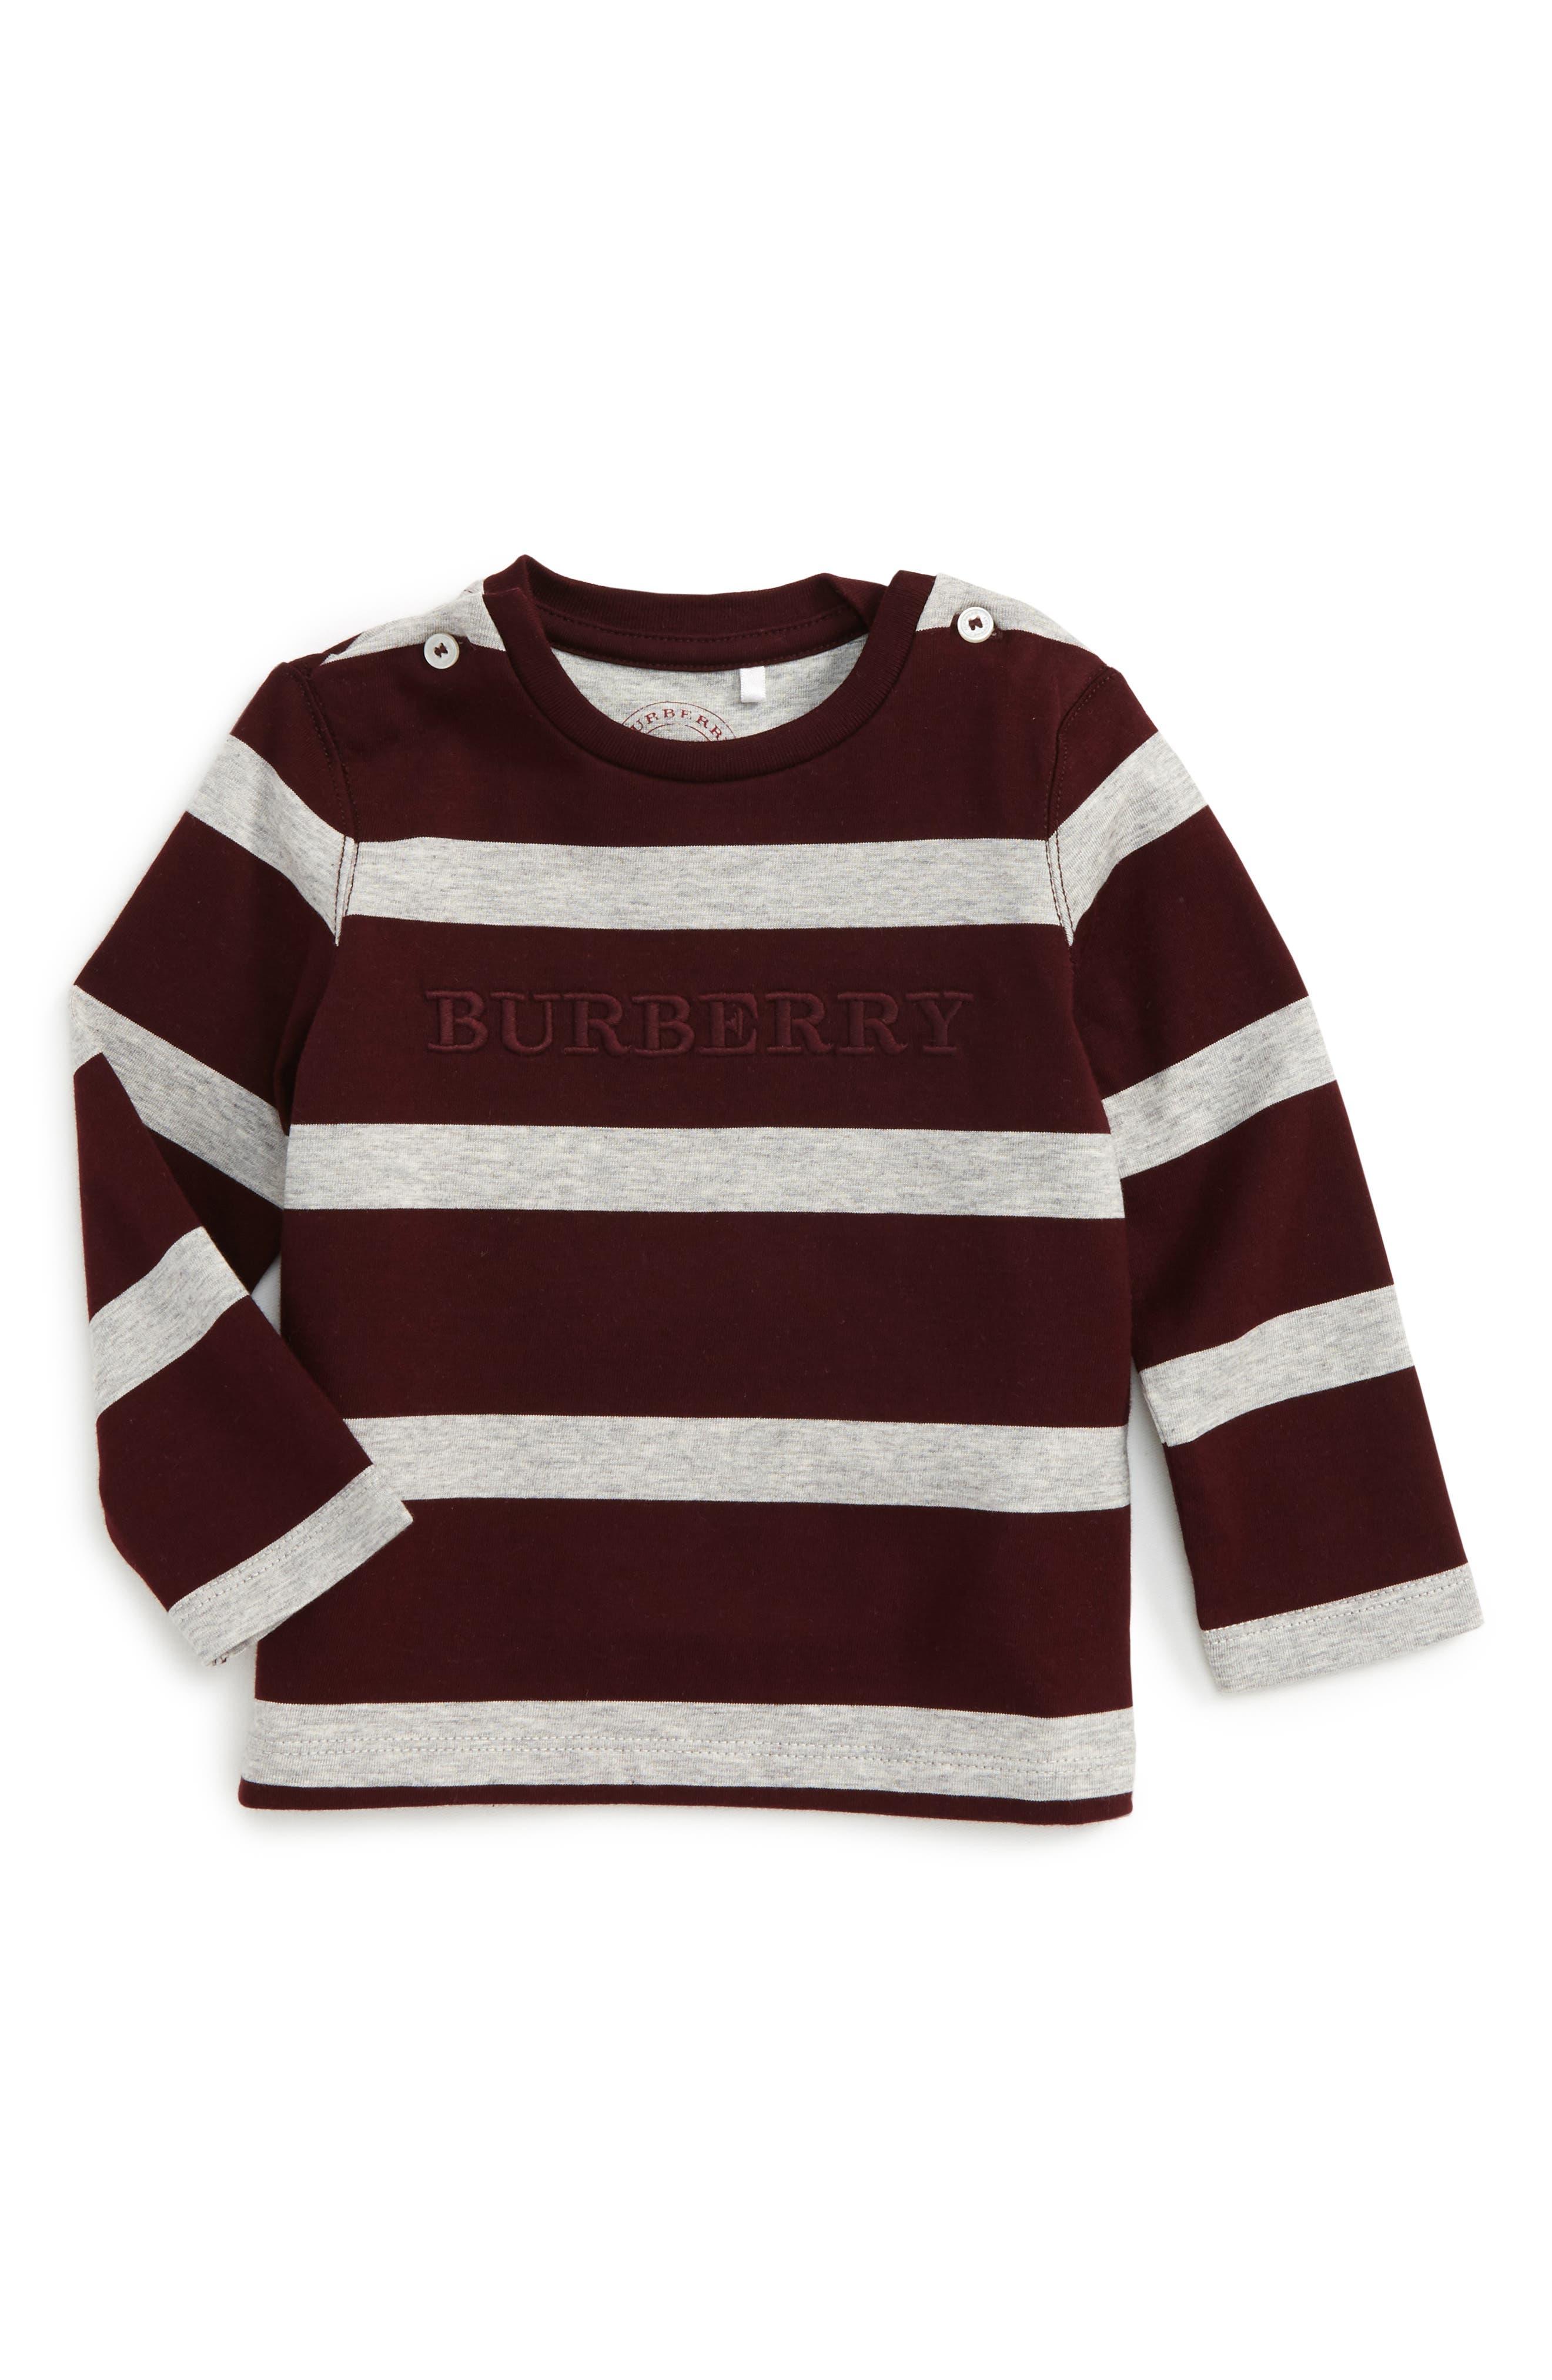 Burberry Mathew Stripe T-Shirt (Baby Boys)